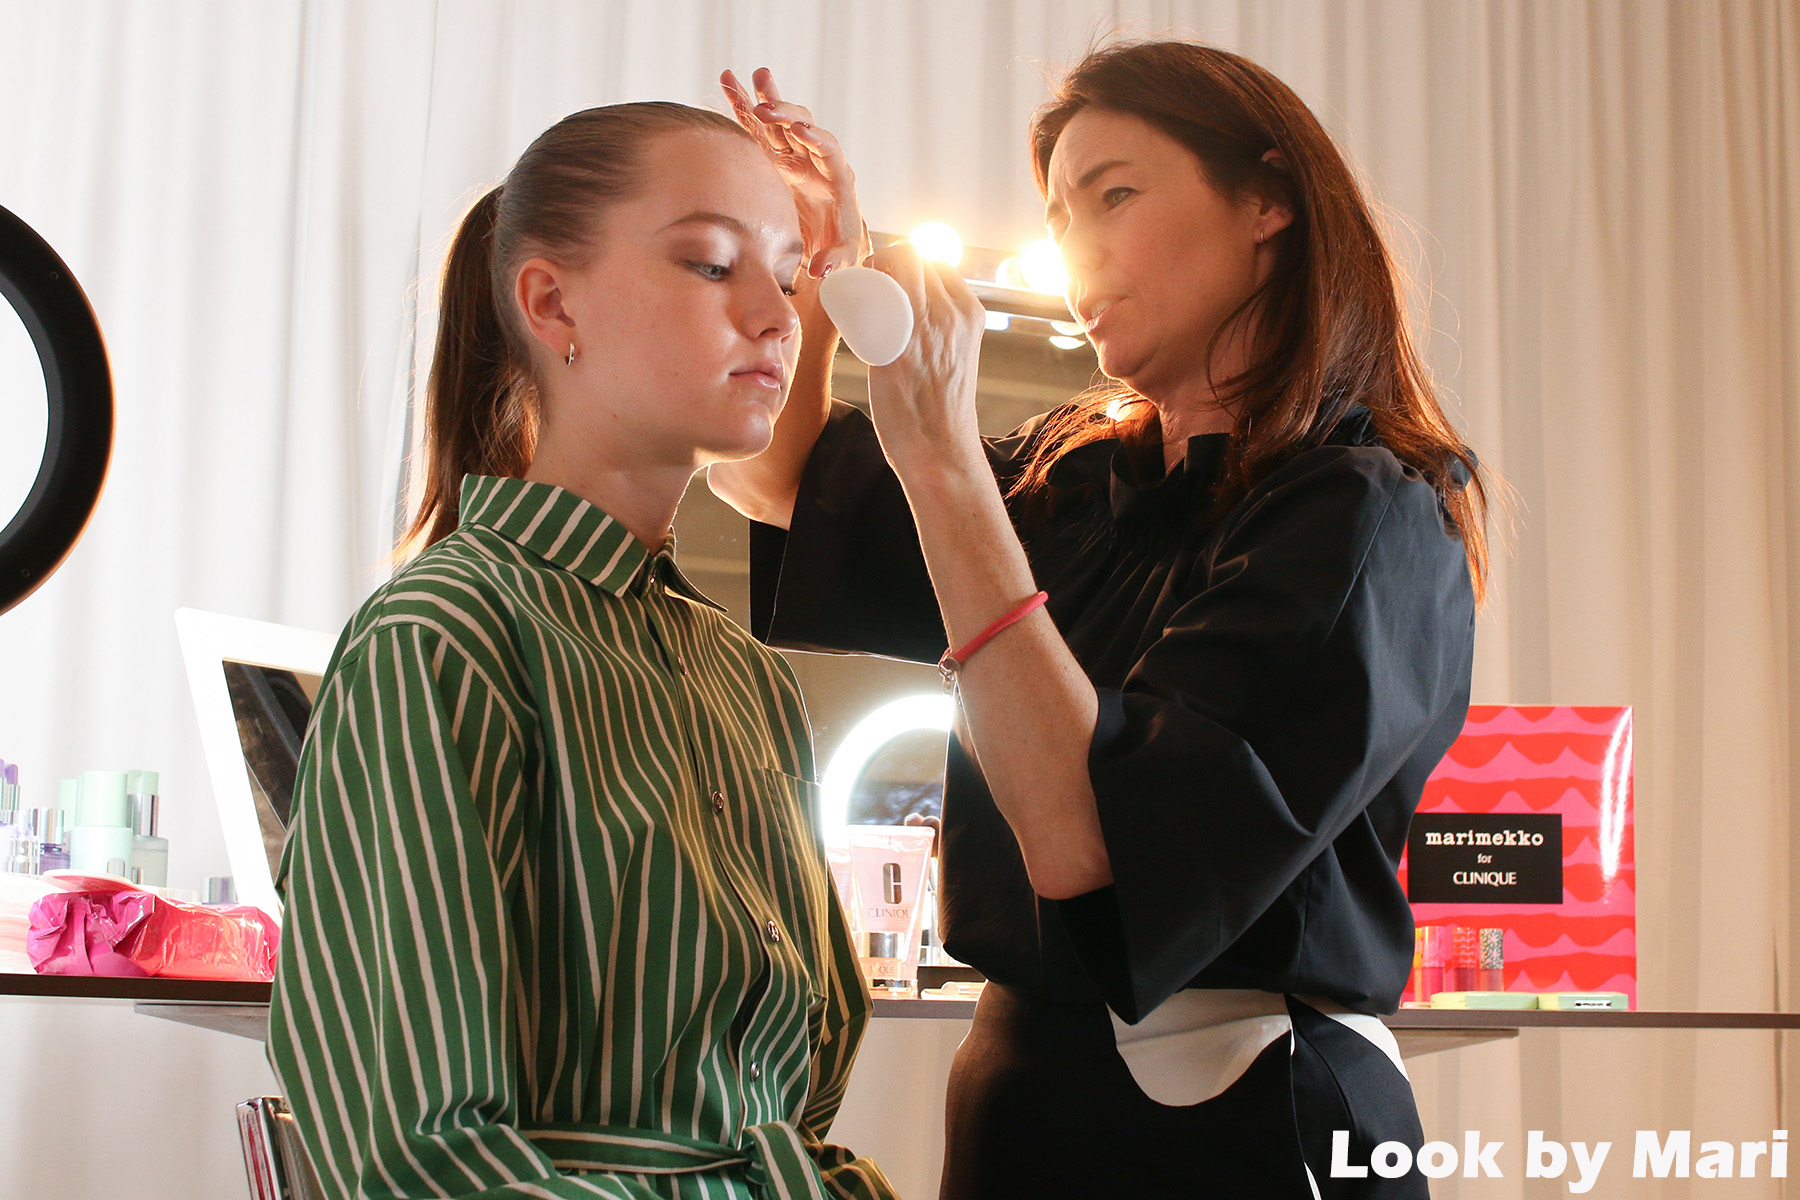 3 florrie white marimekko for clinique makeup demo 13.2.2018-2